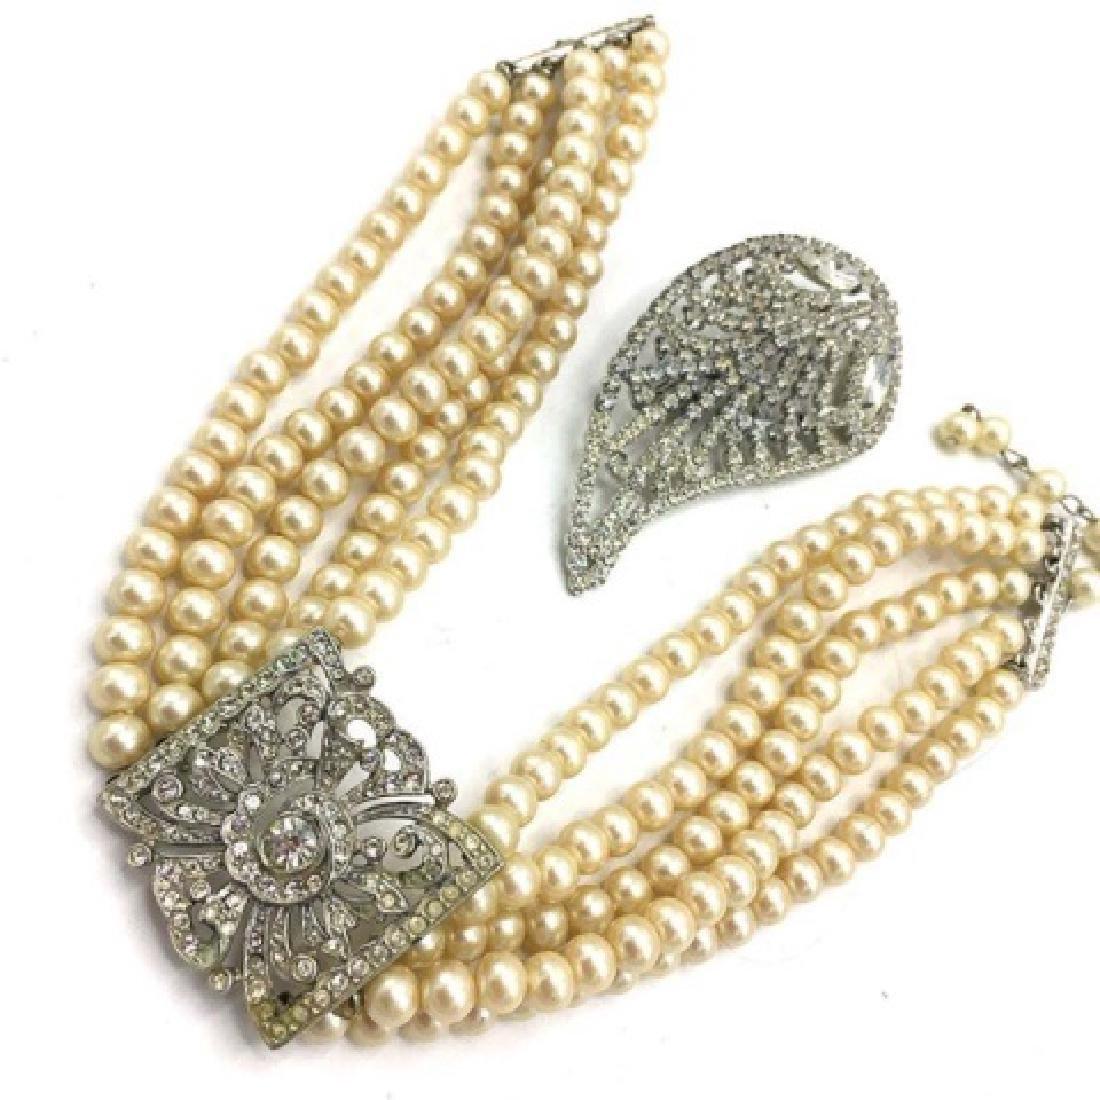 Kenneth J Lane Chocker w/ Rhinestones Jewelry